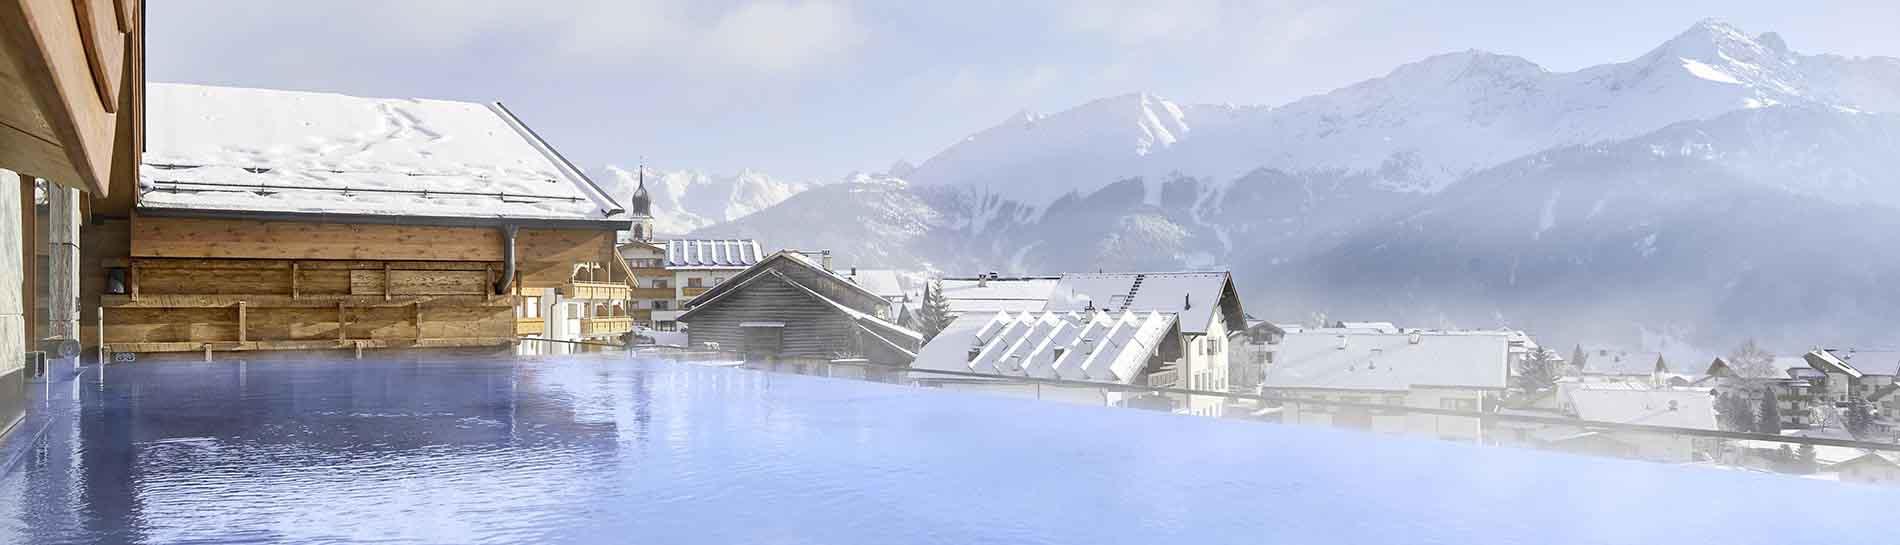 Hotel Tirol Serfaus-Fiss-Ladis Tyrol AUSTRIA Lifestyle, Culinary Experiences, Spa